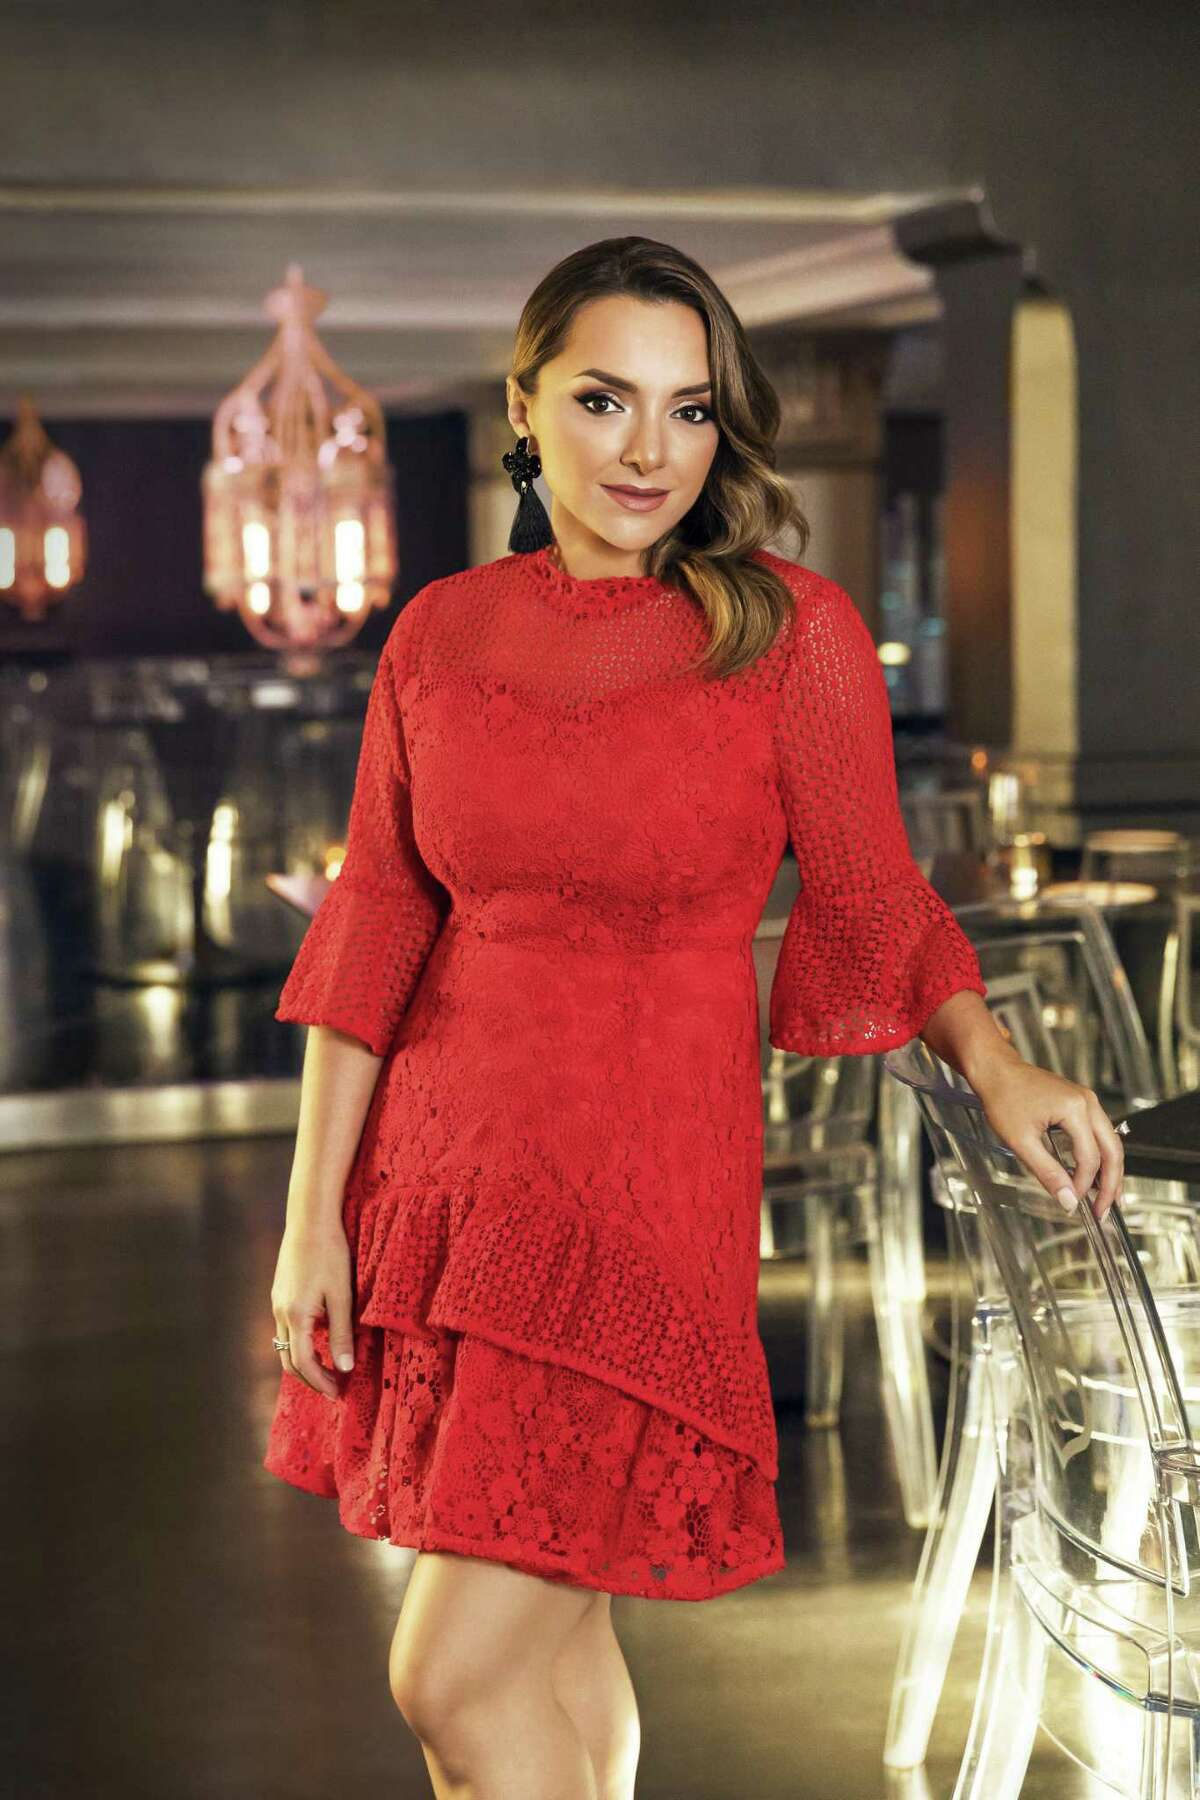 Lorena Martinez stars in 'Texicanas,' Bravo's new docuseries about several stylish women set in San Antonio.